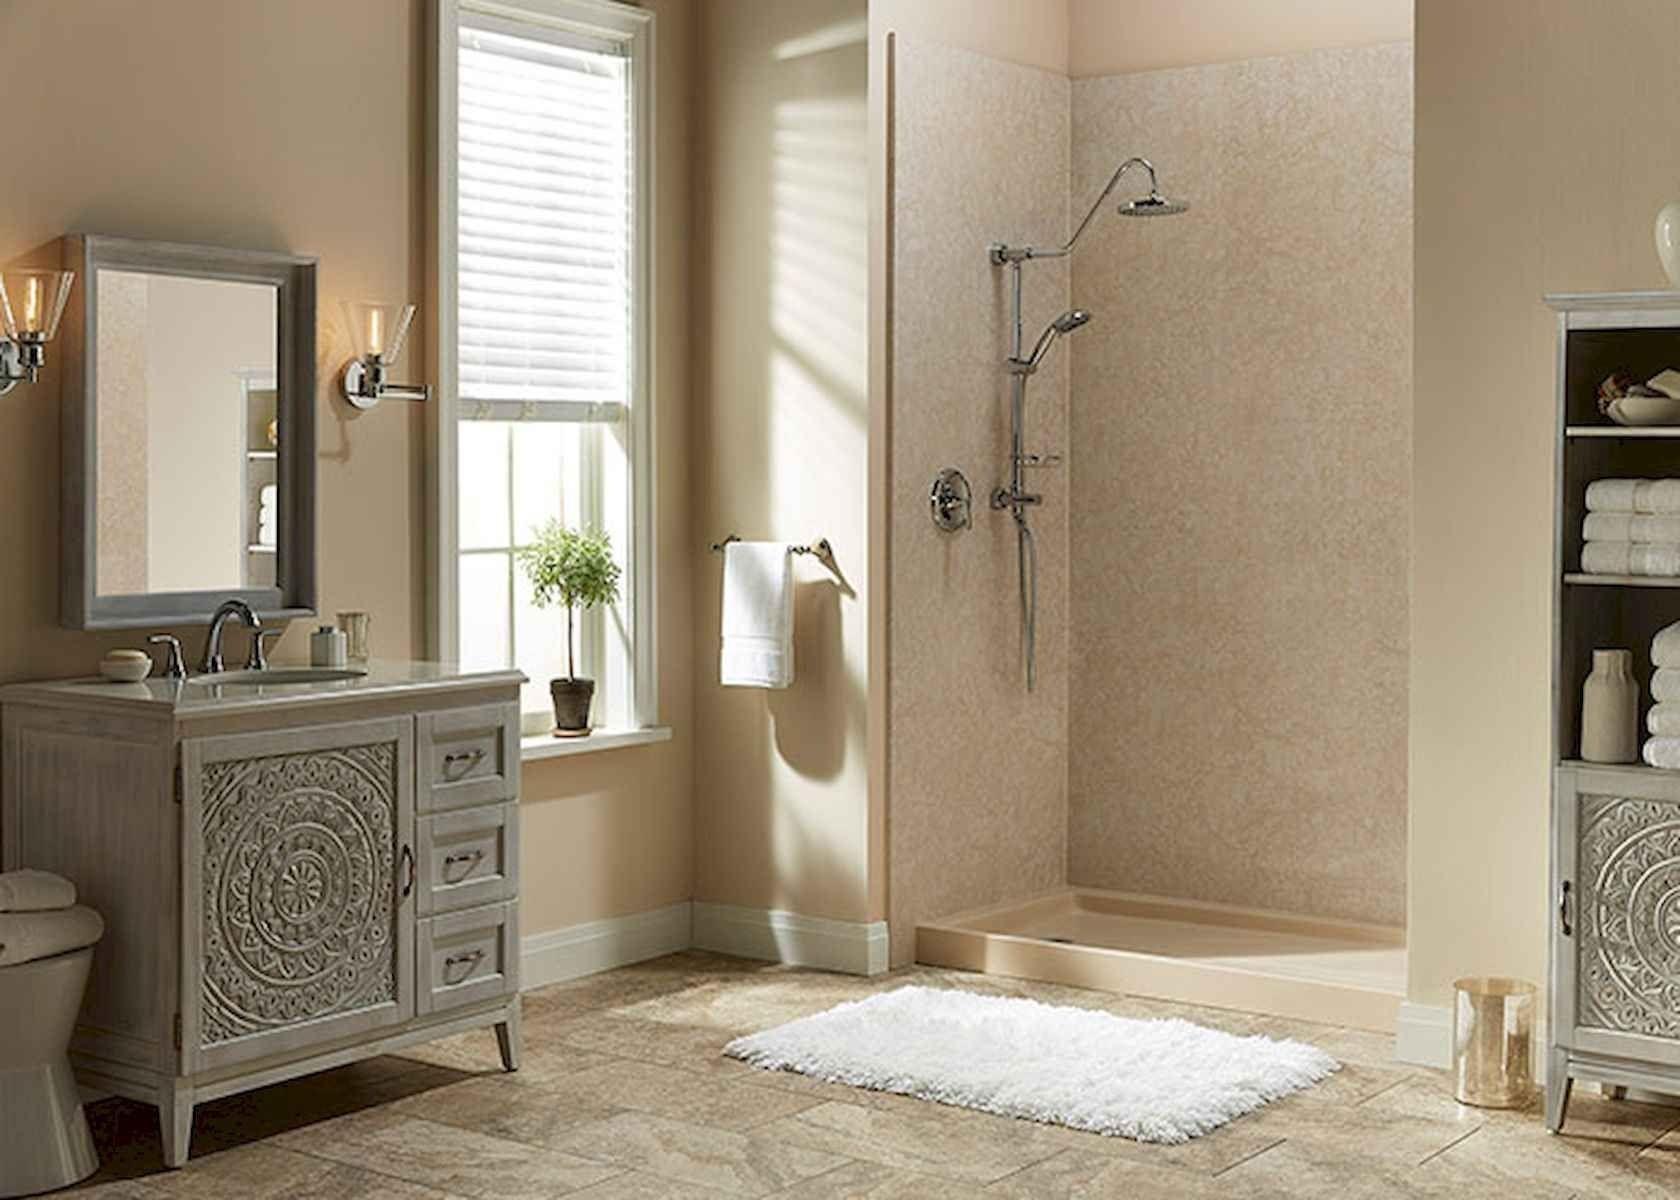 01 Cool Small Master Bathroom Remodel Ideas Bathroom Inspiration Modern Zen Bathroom Decor Bathroom Remodel Master